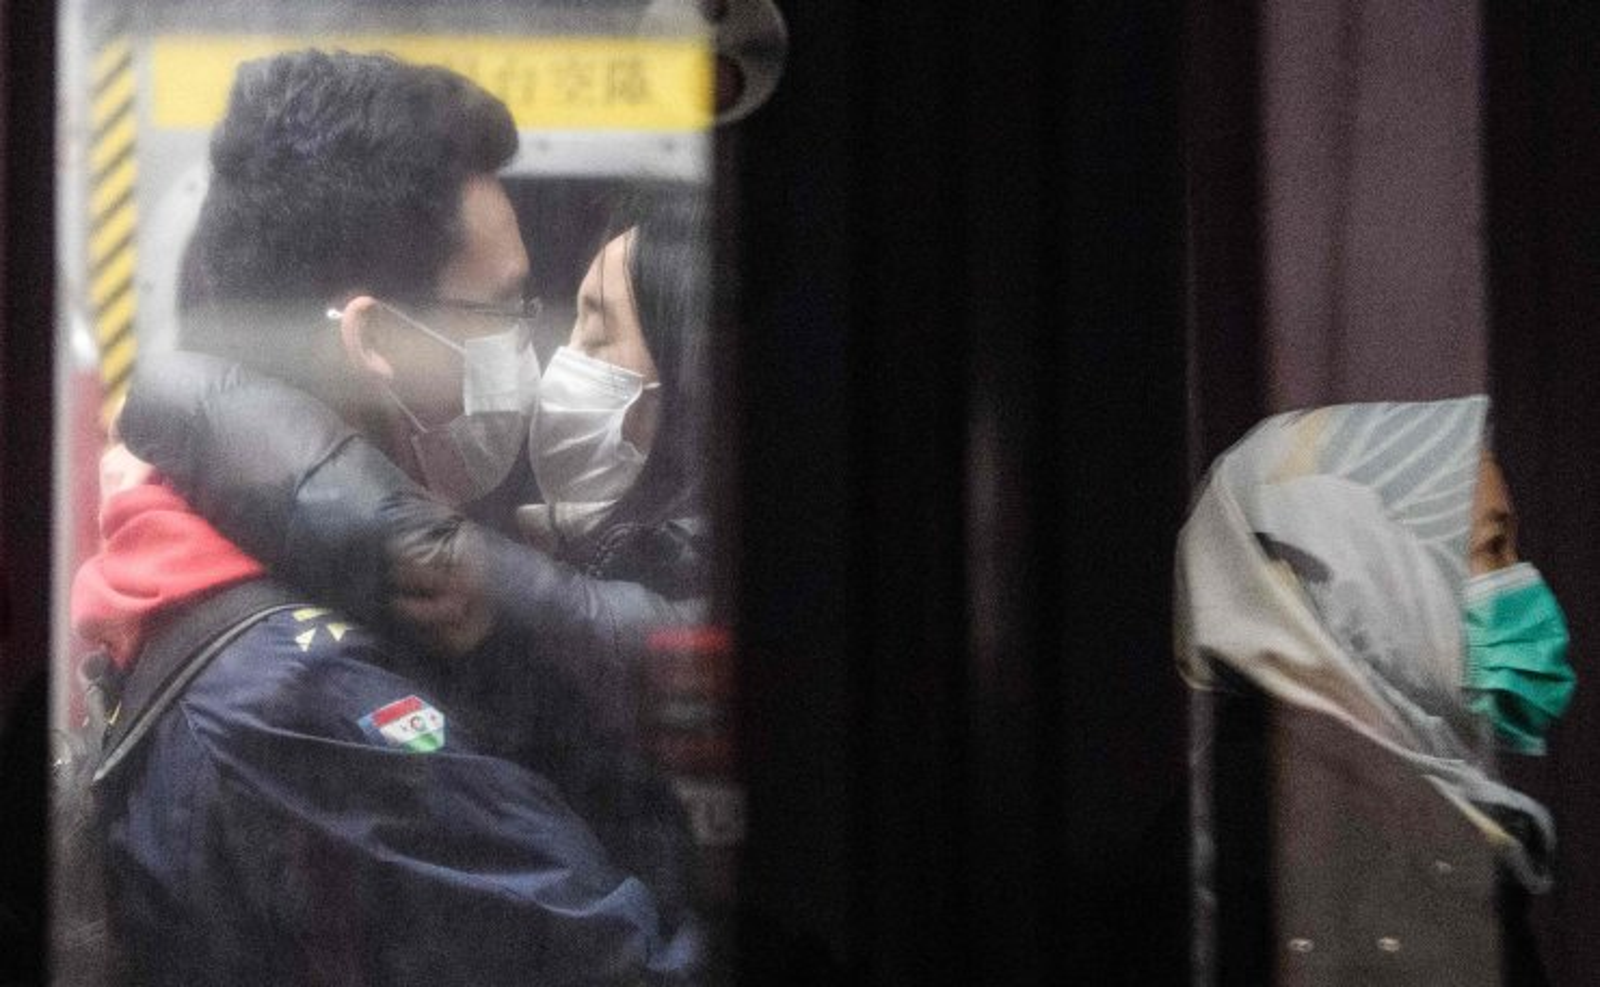 Medical team members heading to Wuhan to reinforce hospitals fighting the coronavirus outbreak prepare to board the train at Nanjing South Railway Station  in Nanjing City, Jiangsu Province, China, 25 January 2020 . EPA